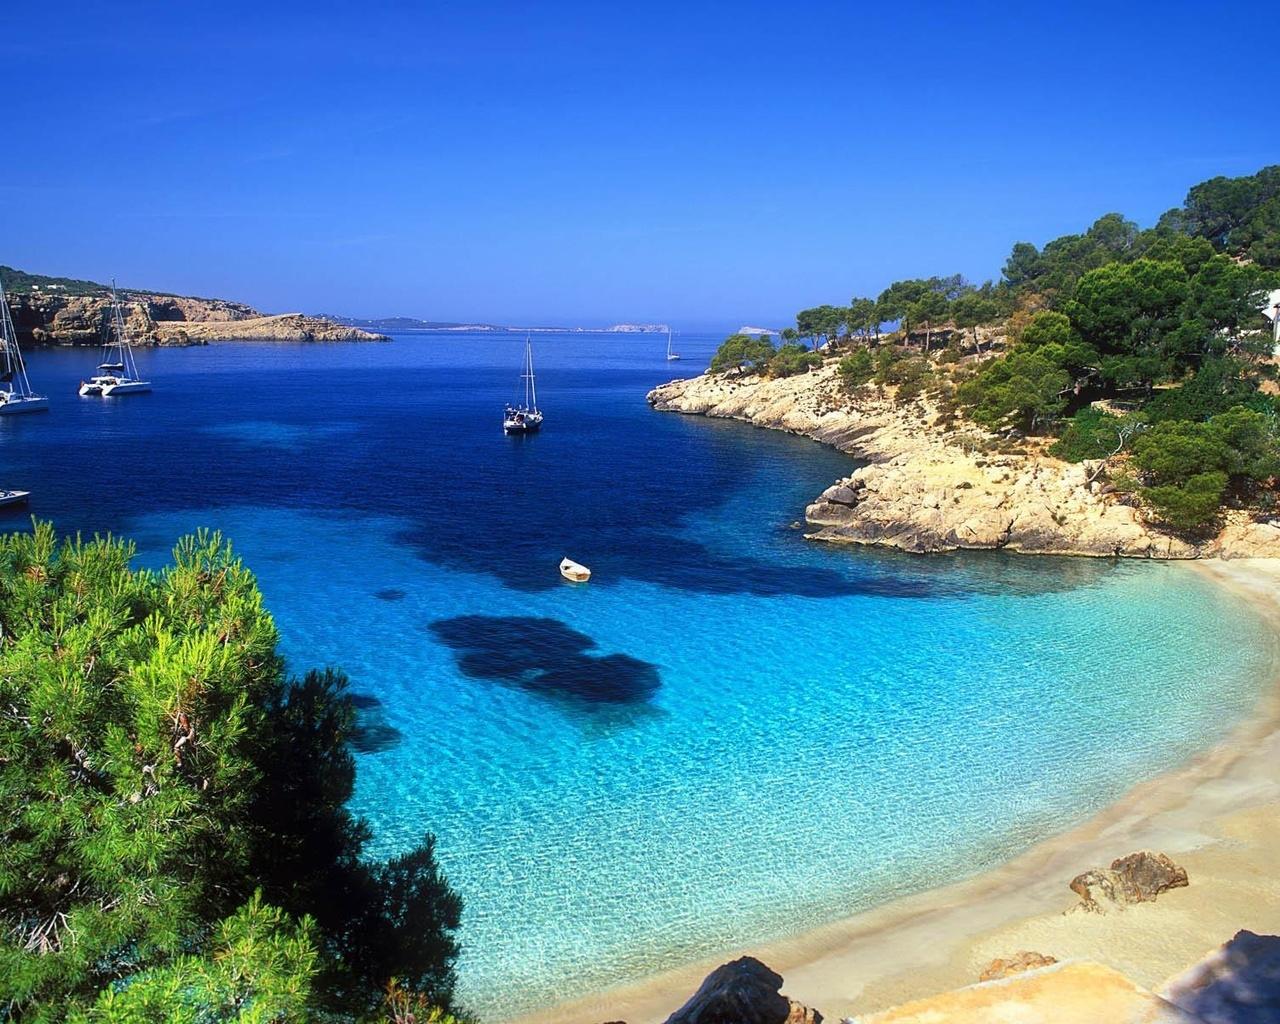 Beautiful sea landscape for 1280 x 1024 resolution